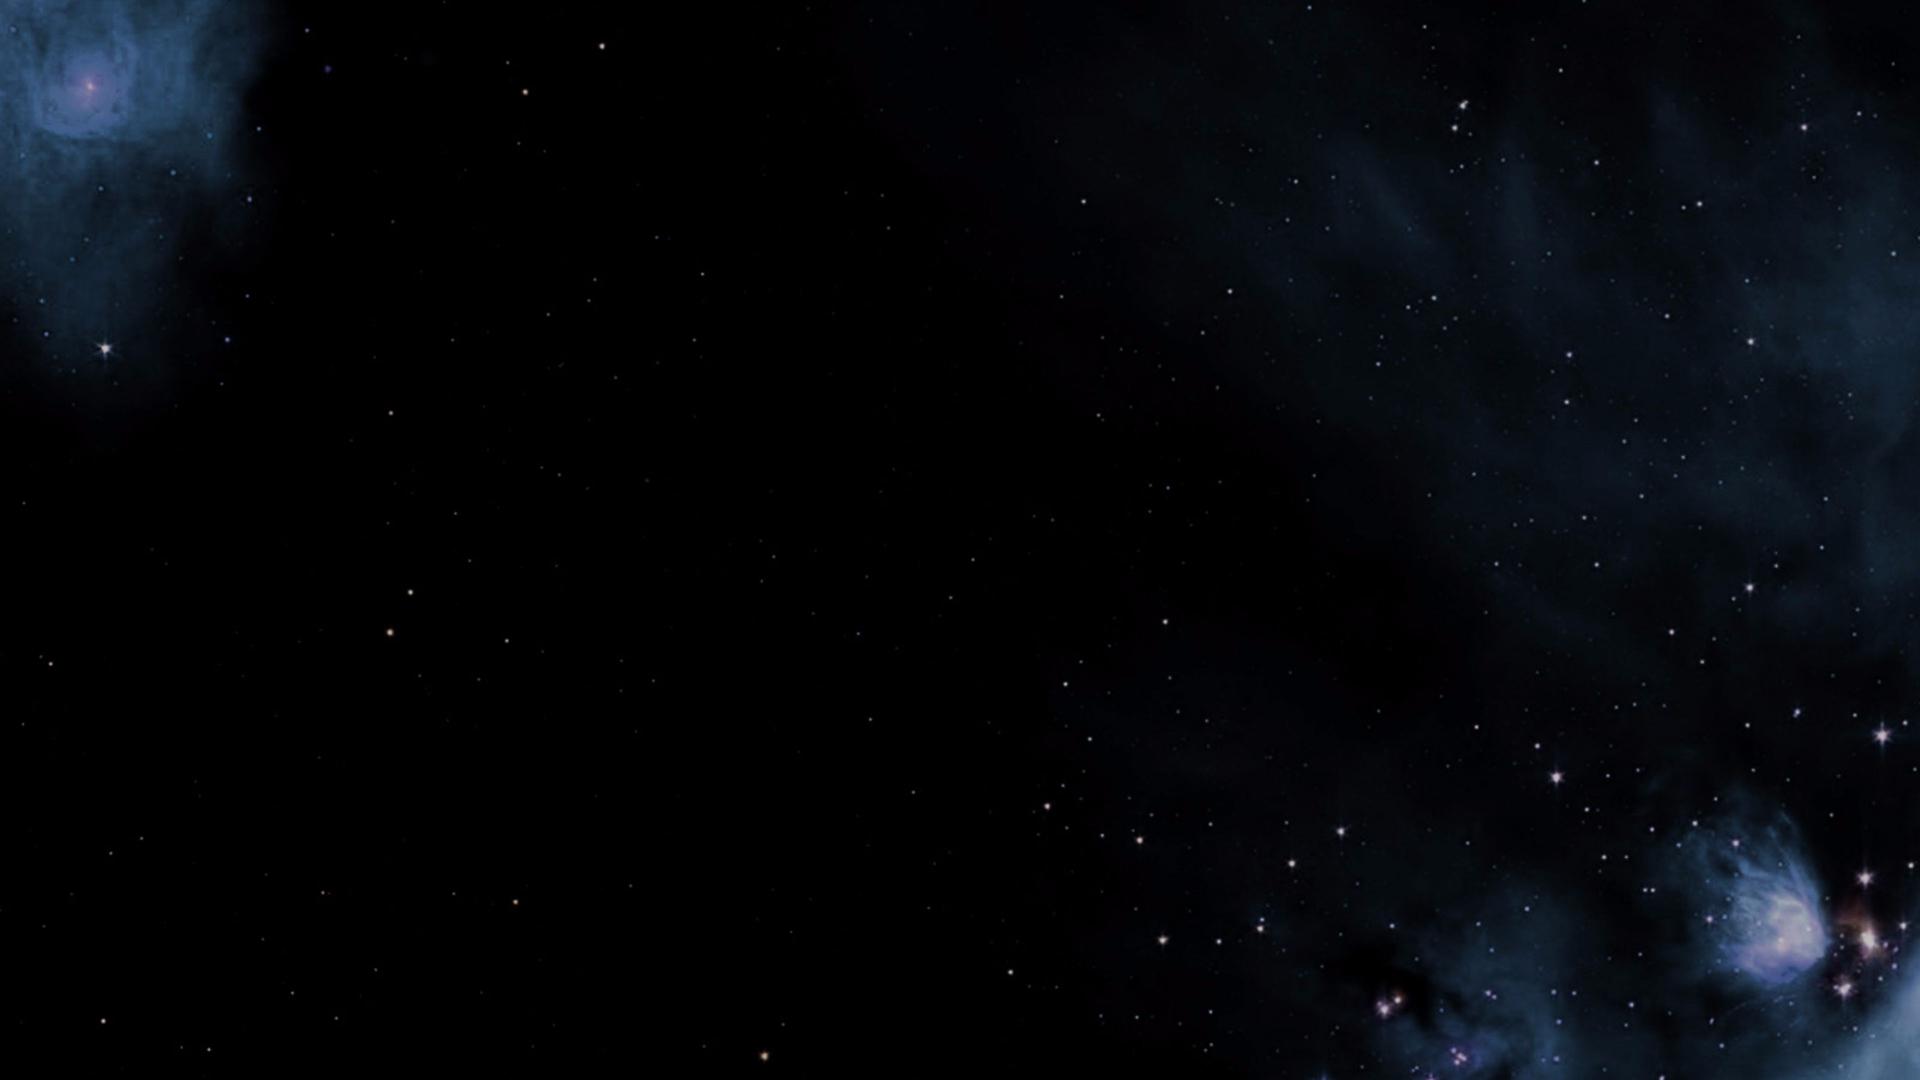 Free Download Dark Deep Space 4k Wallpaper 4k Wallpaper 3840x2160